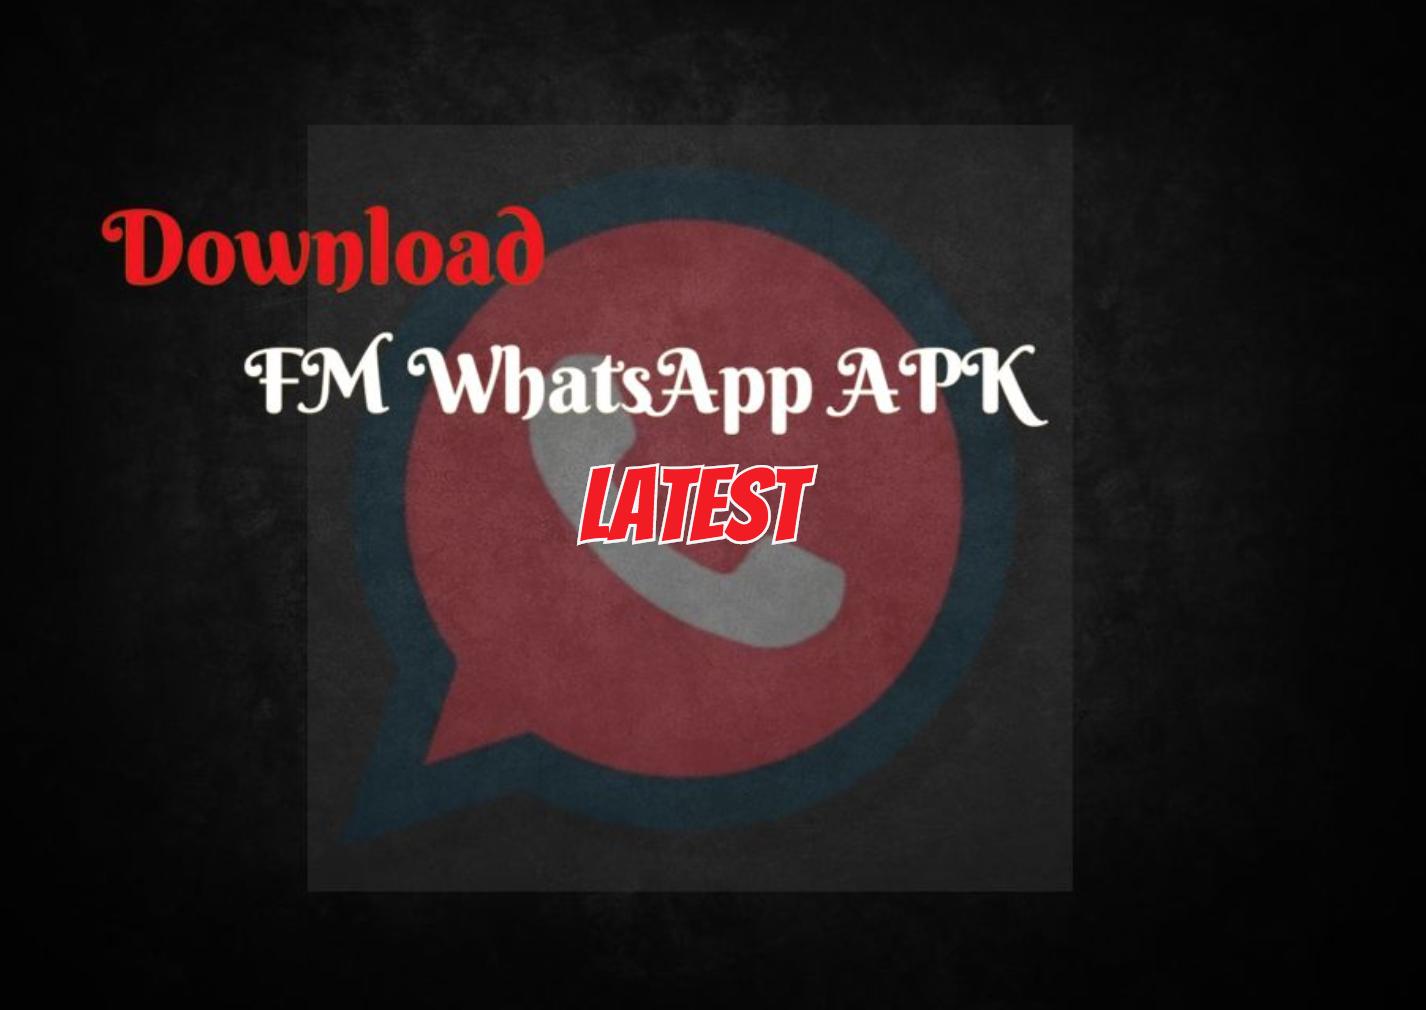 FM WhatsApp APK